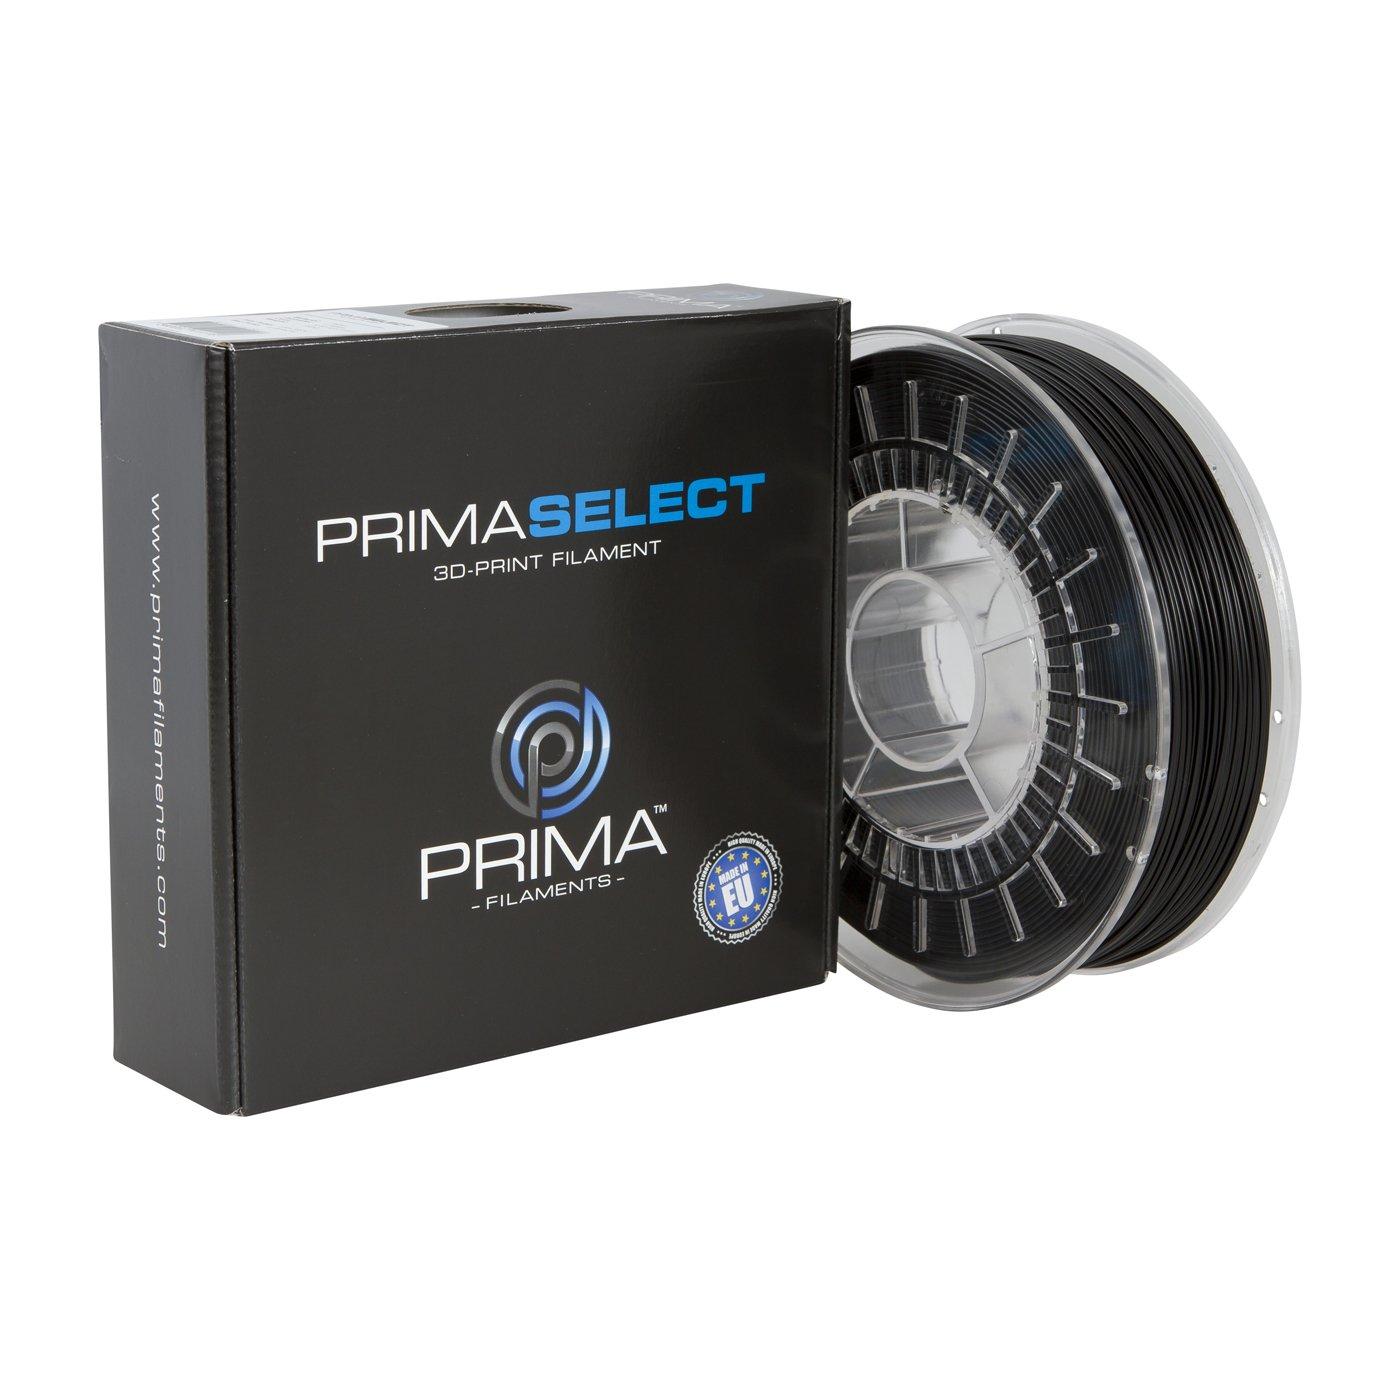 Prima filaments Ps-asap-175–0750-wh Primaselect ASA + Filament, 1.75mm, 750g, Parent